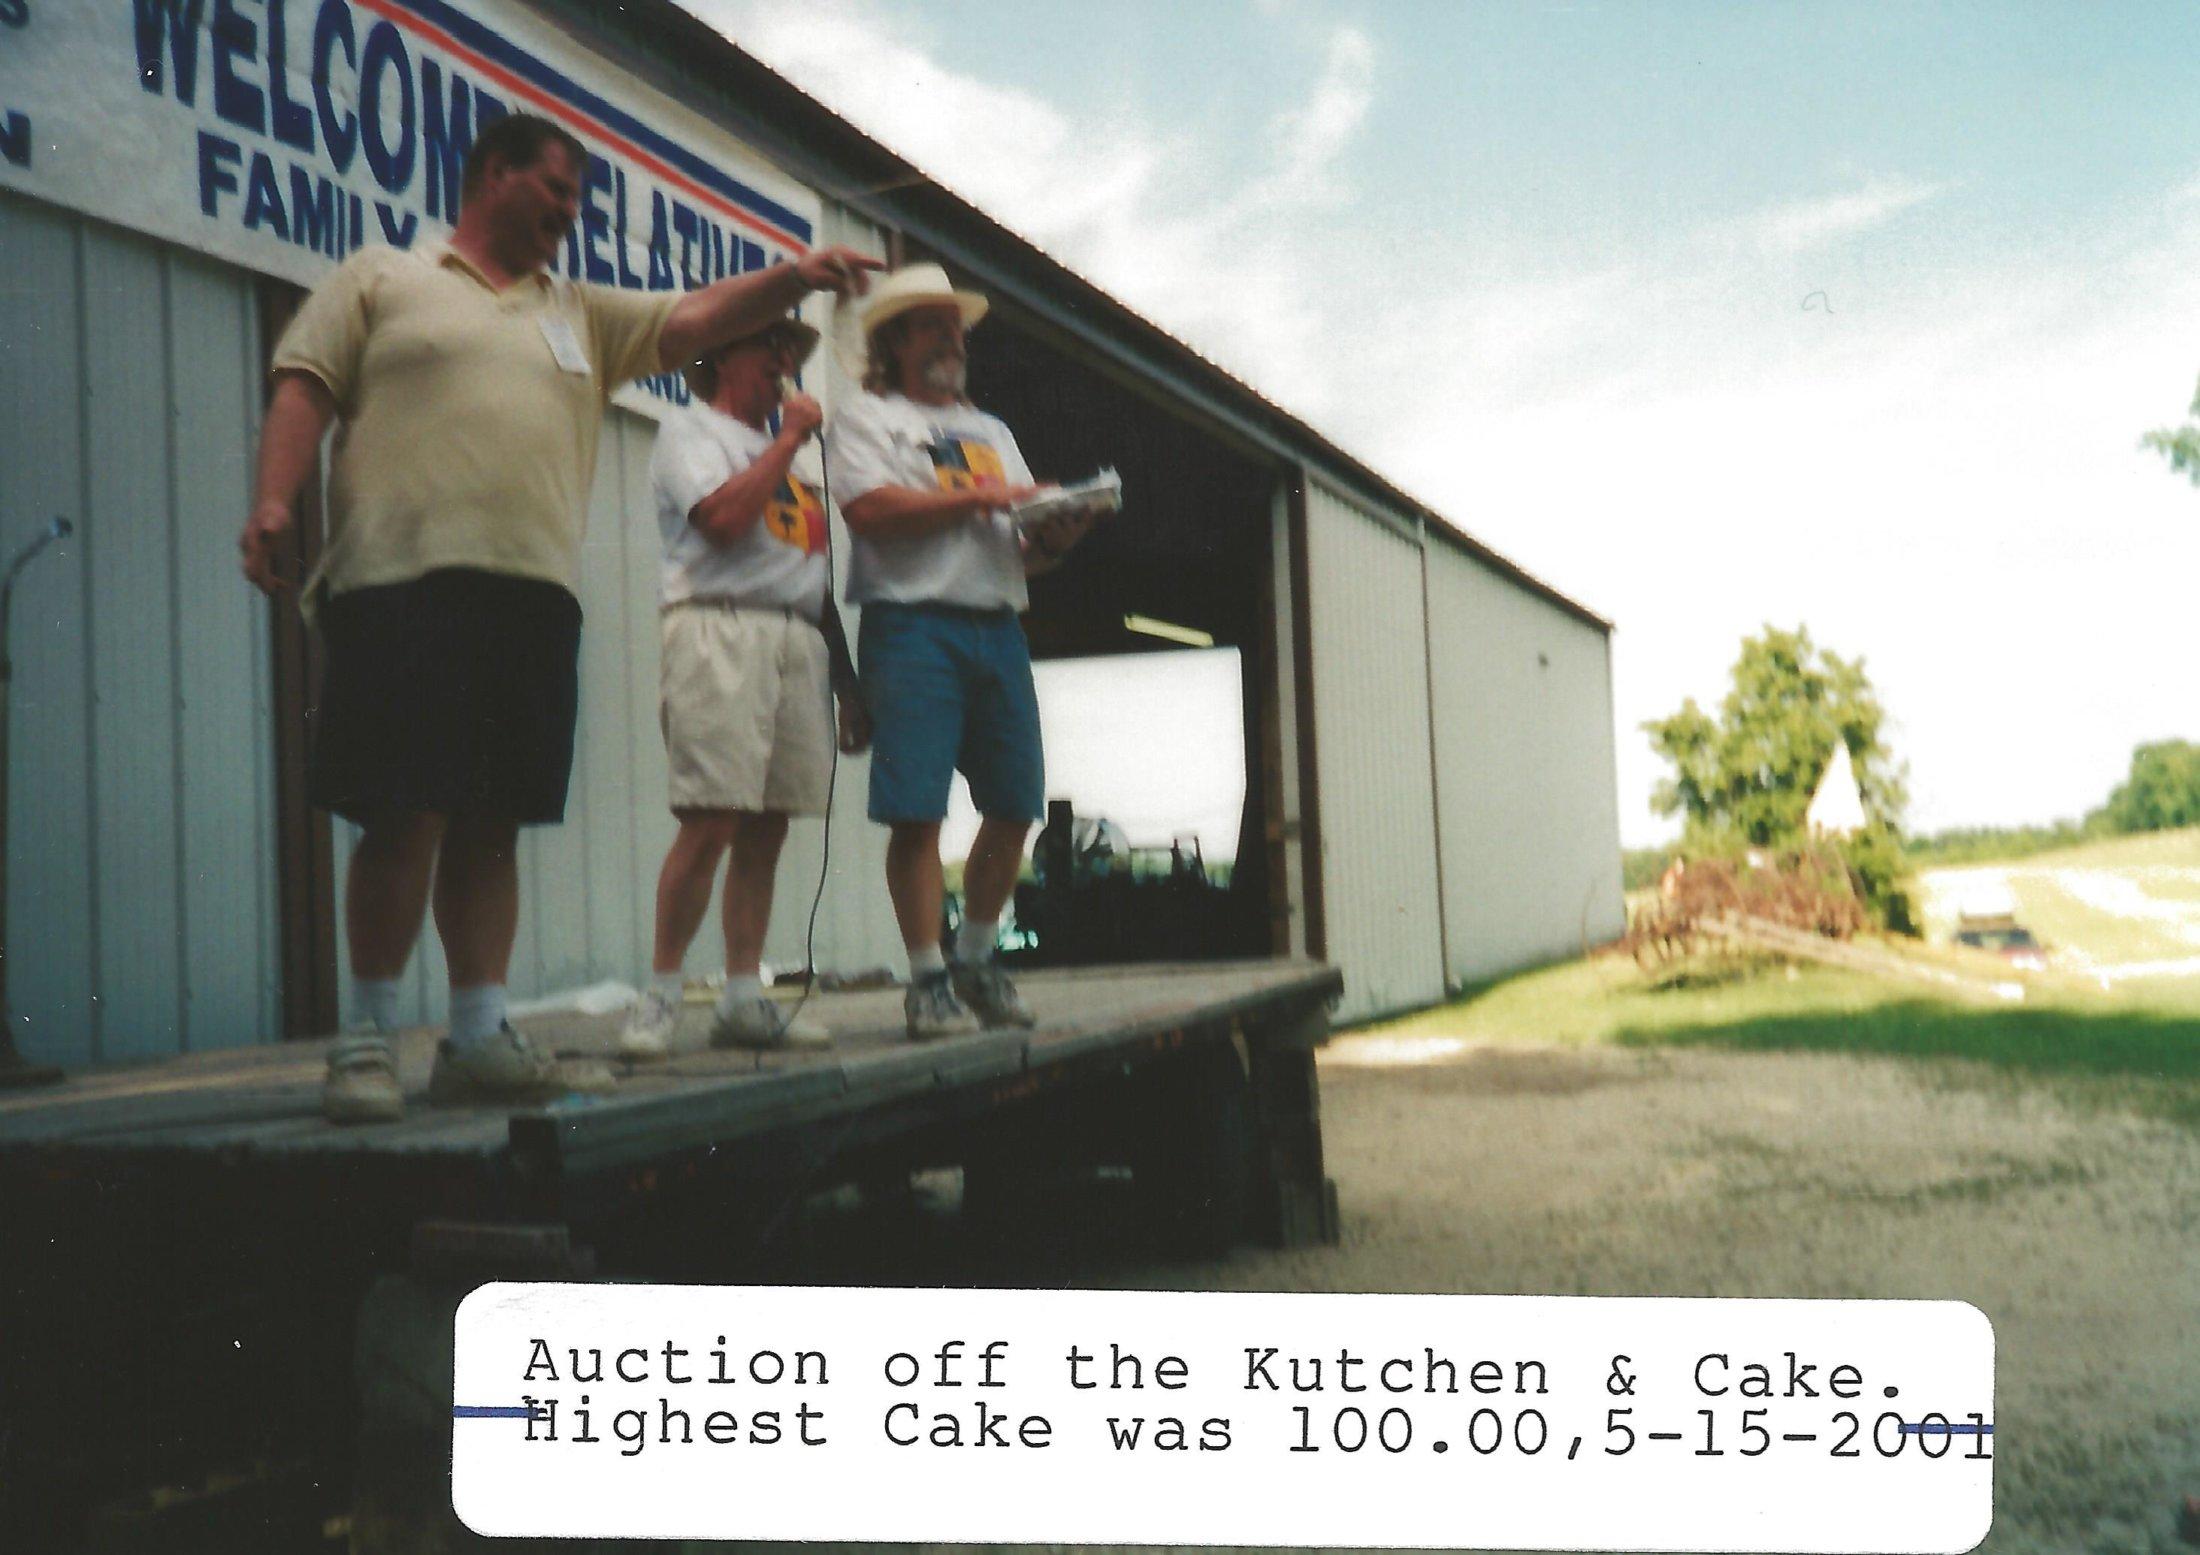 Kuchen Auction - Keith, Walter, David